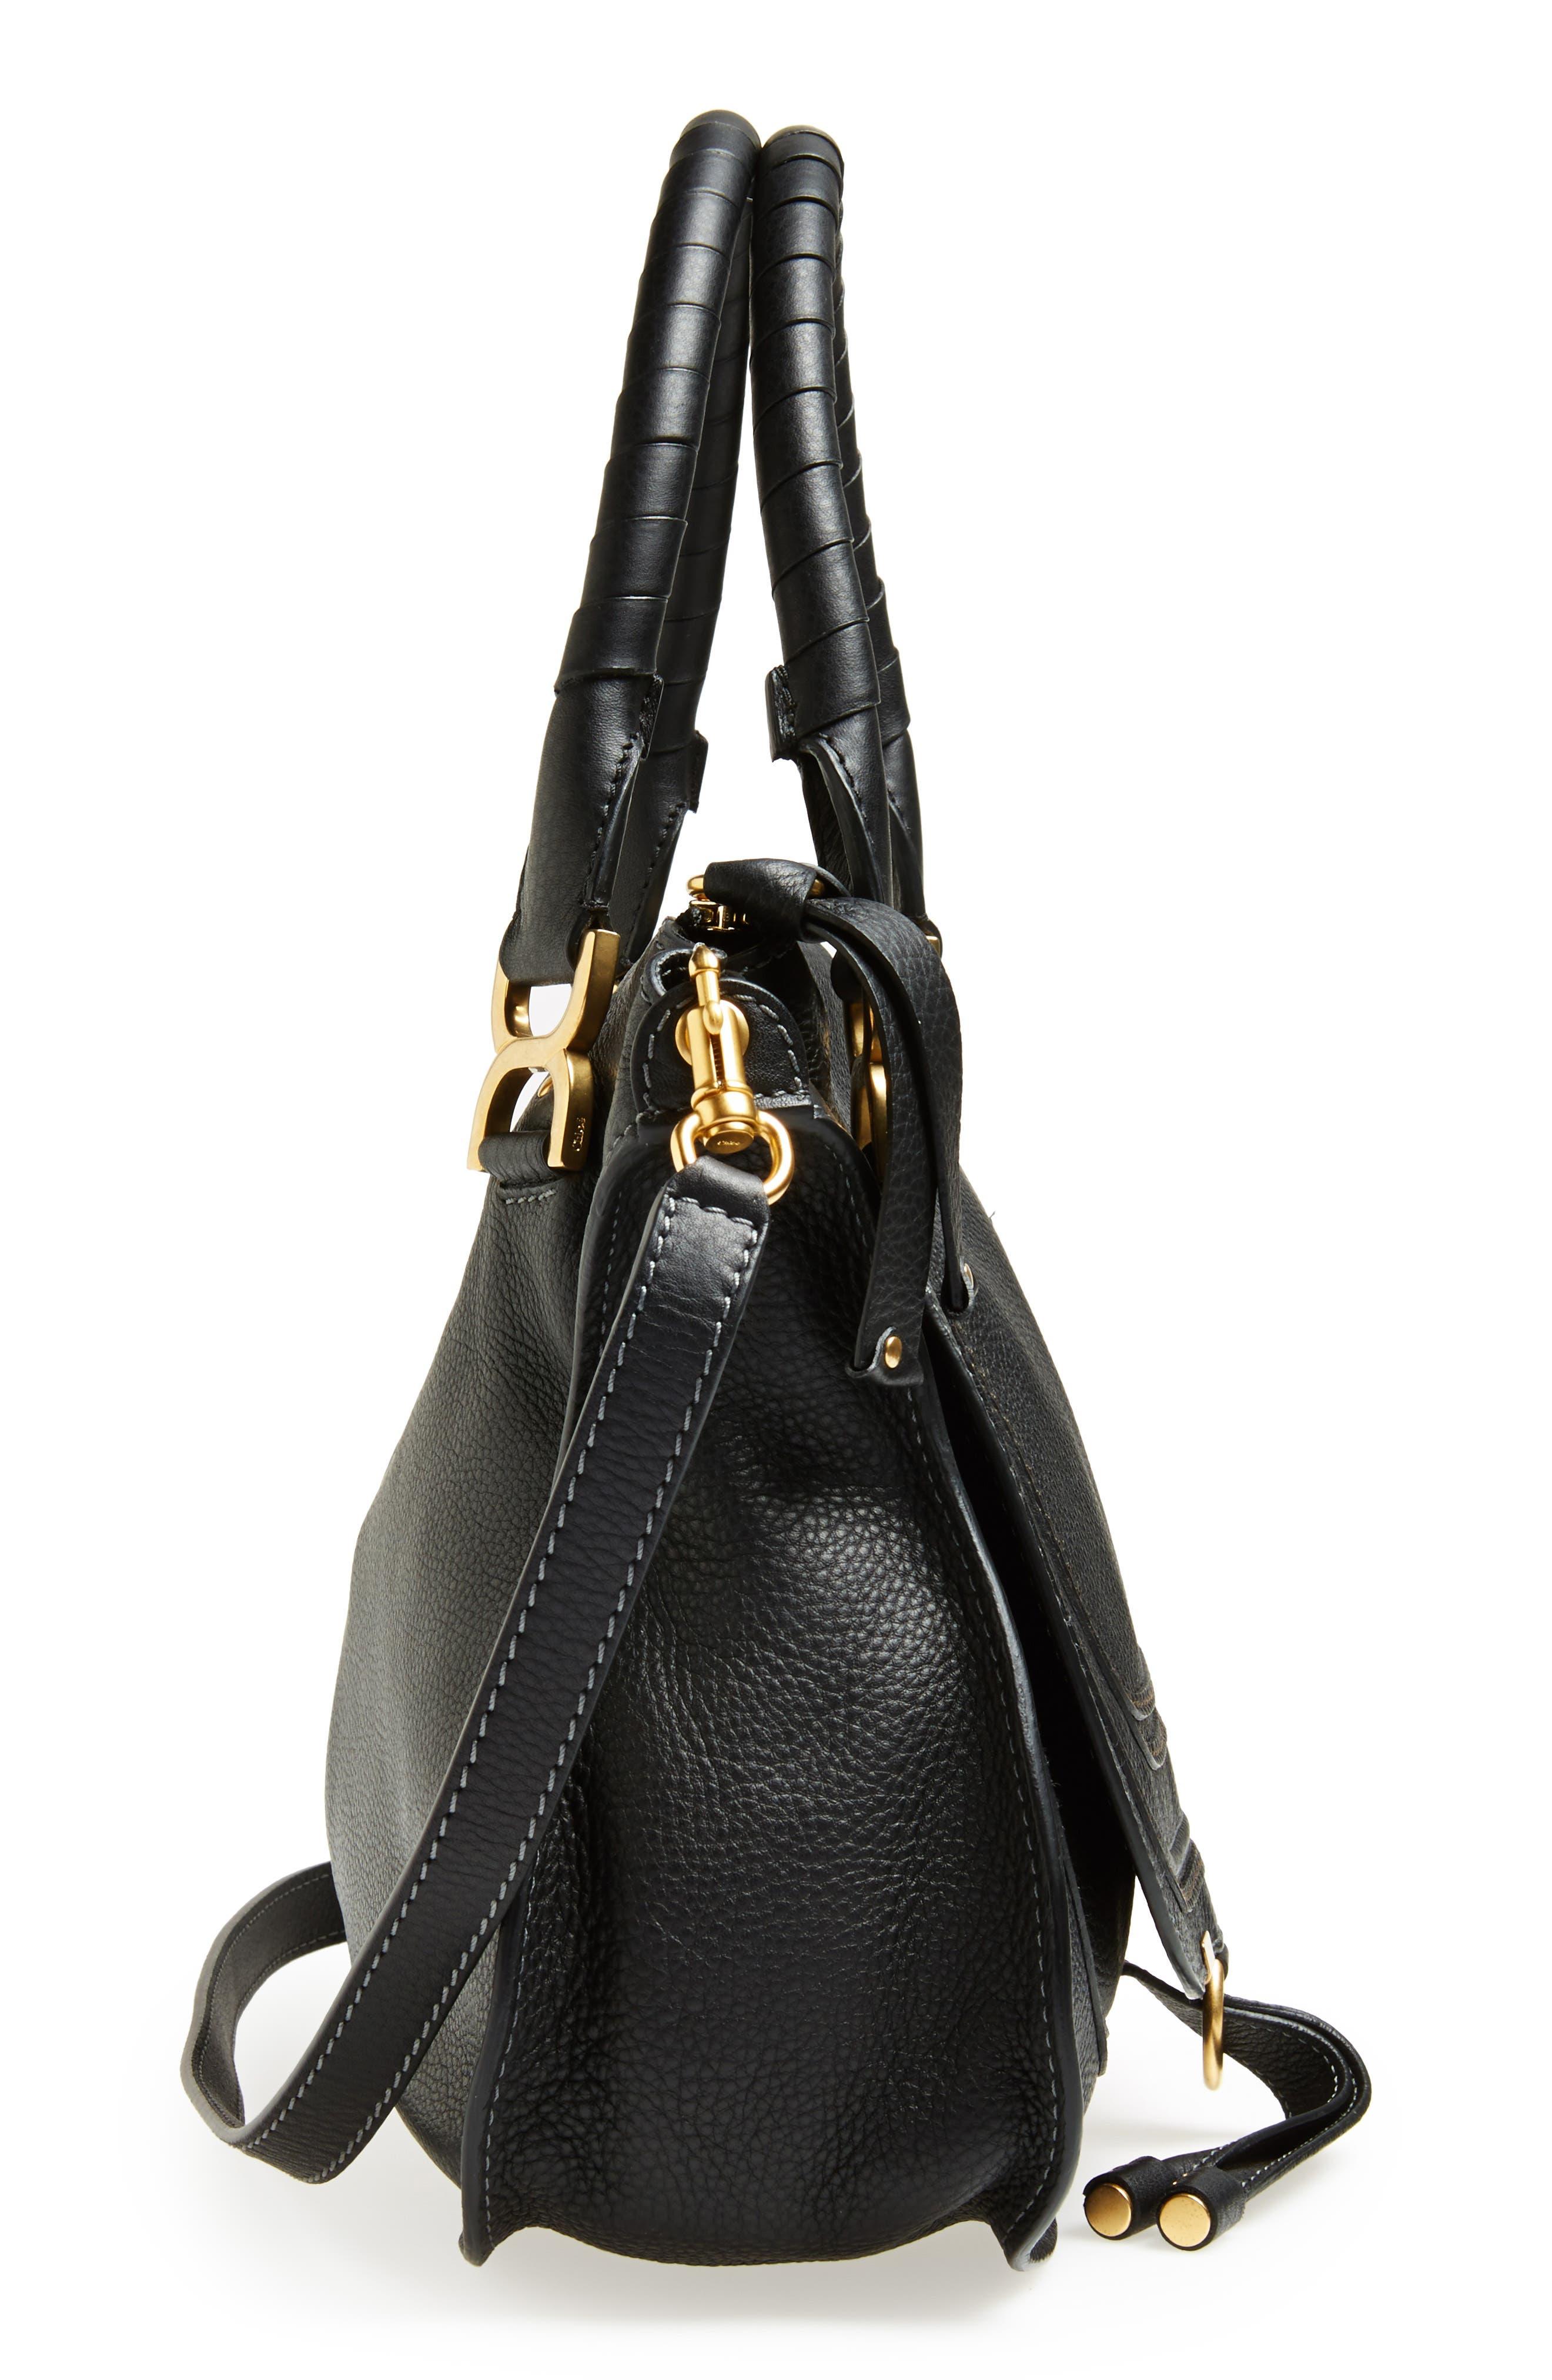 CHLOÉ, 'Medium Marcie' Leather Satchel, Alternate thumbnail 5, color, BLACK GOLD HRDWRE